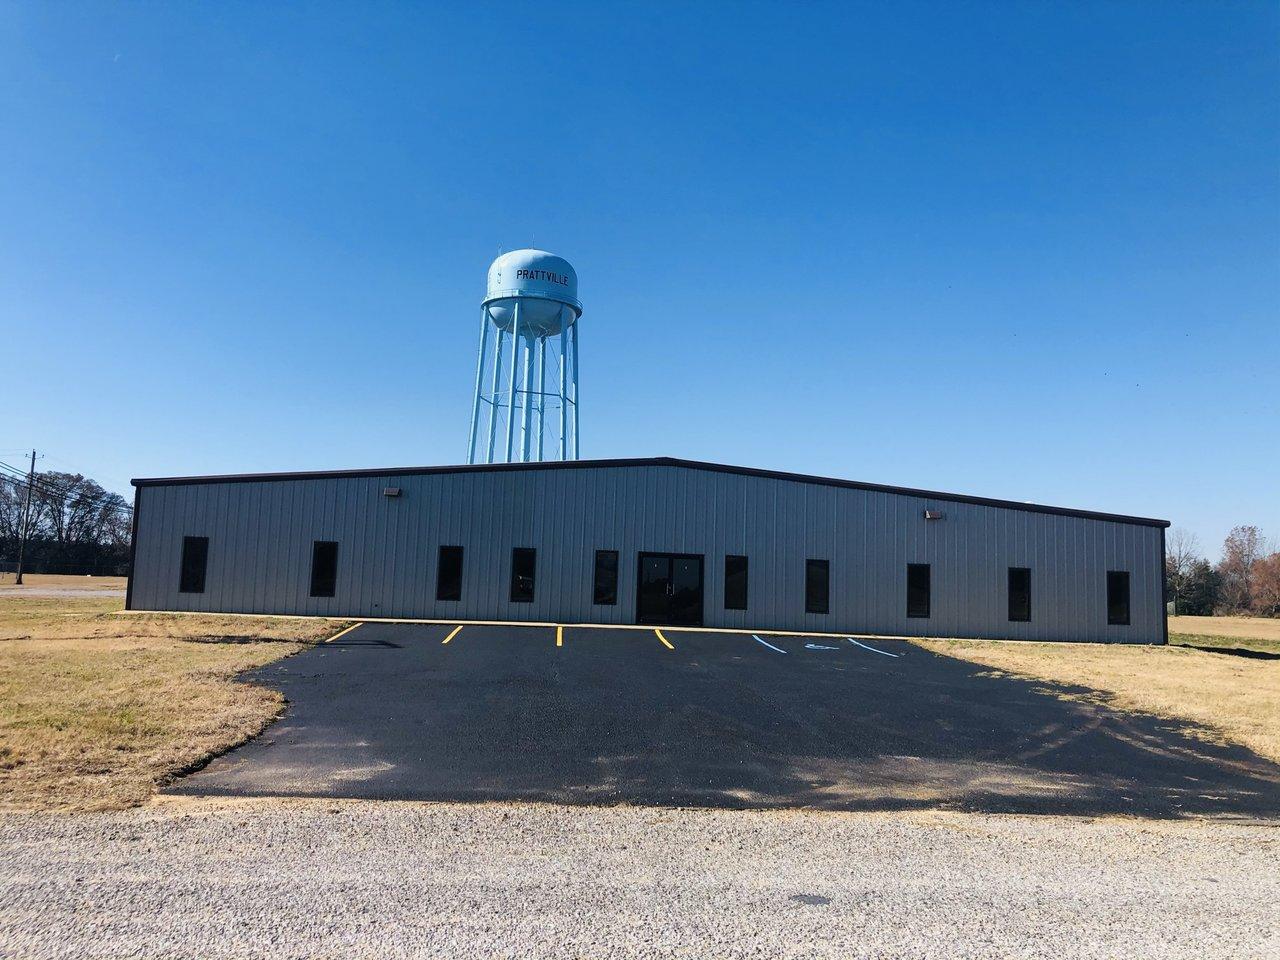 936 S Industrial Park Rd, Prattville, AL, 36067